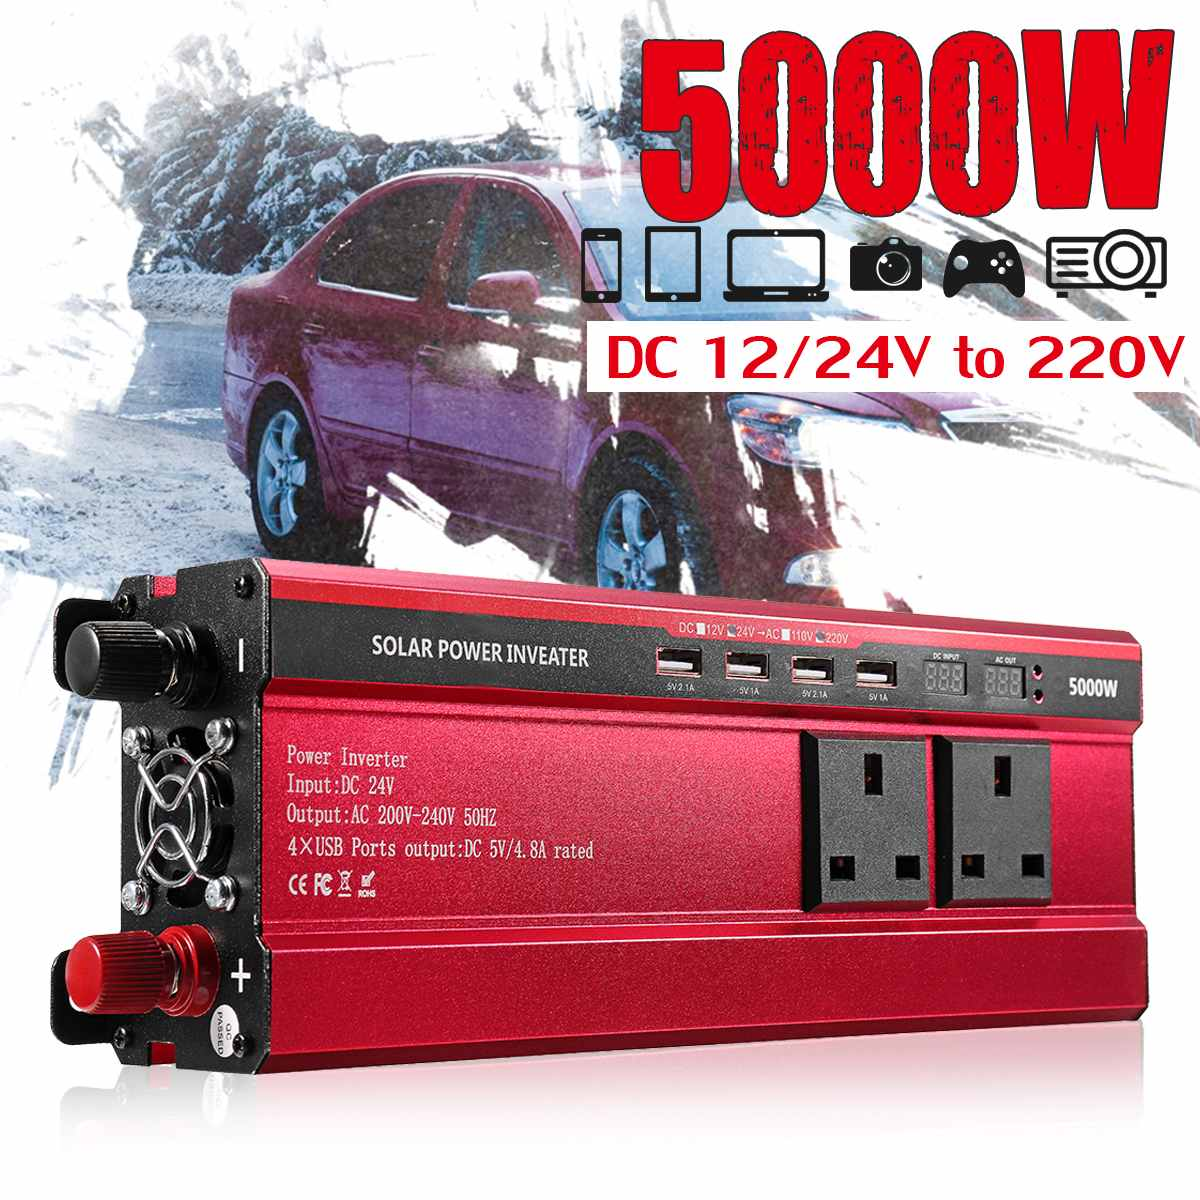 Autoleader 5000W الشمسية عاكس الطاقة DC 12 V/24 V إلى AC 110 V/220 V تعديل شرط موجة تحويل ل سيارة و شاحنة